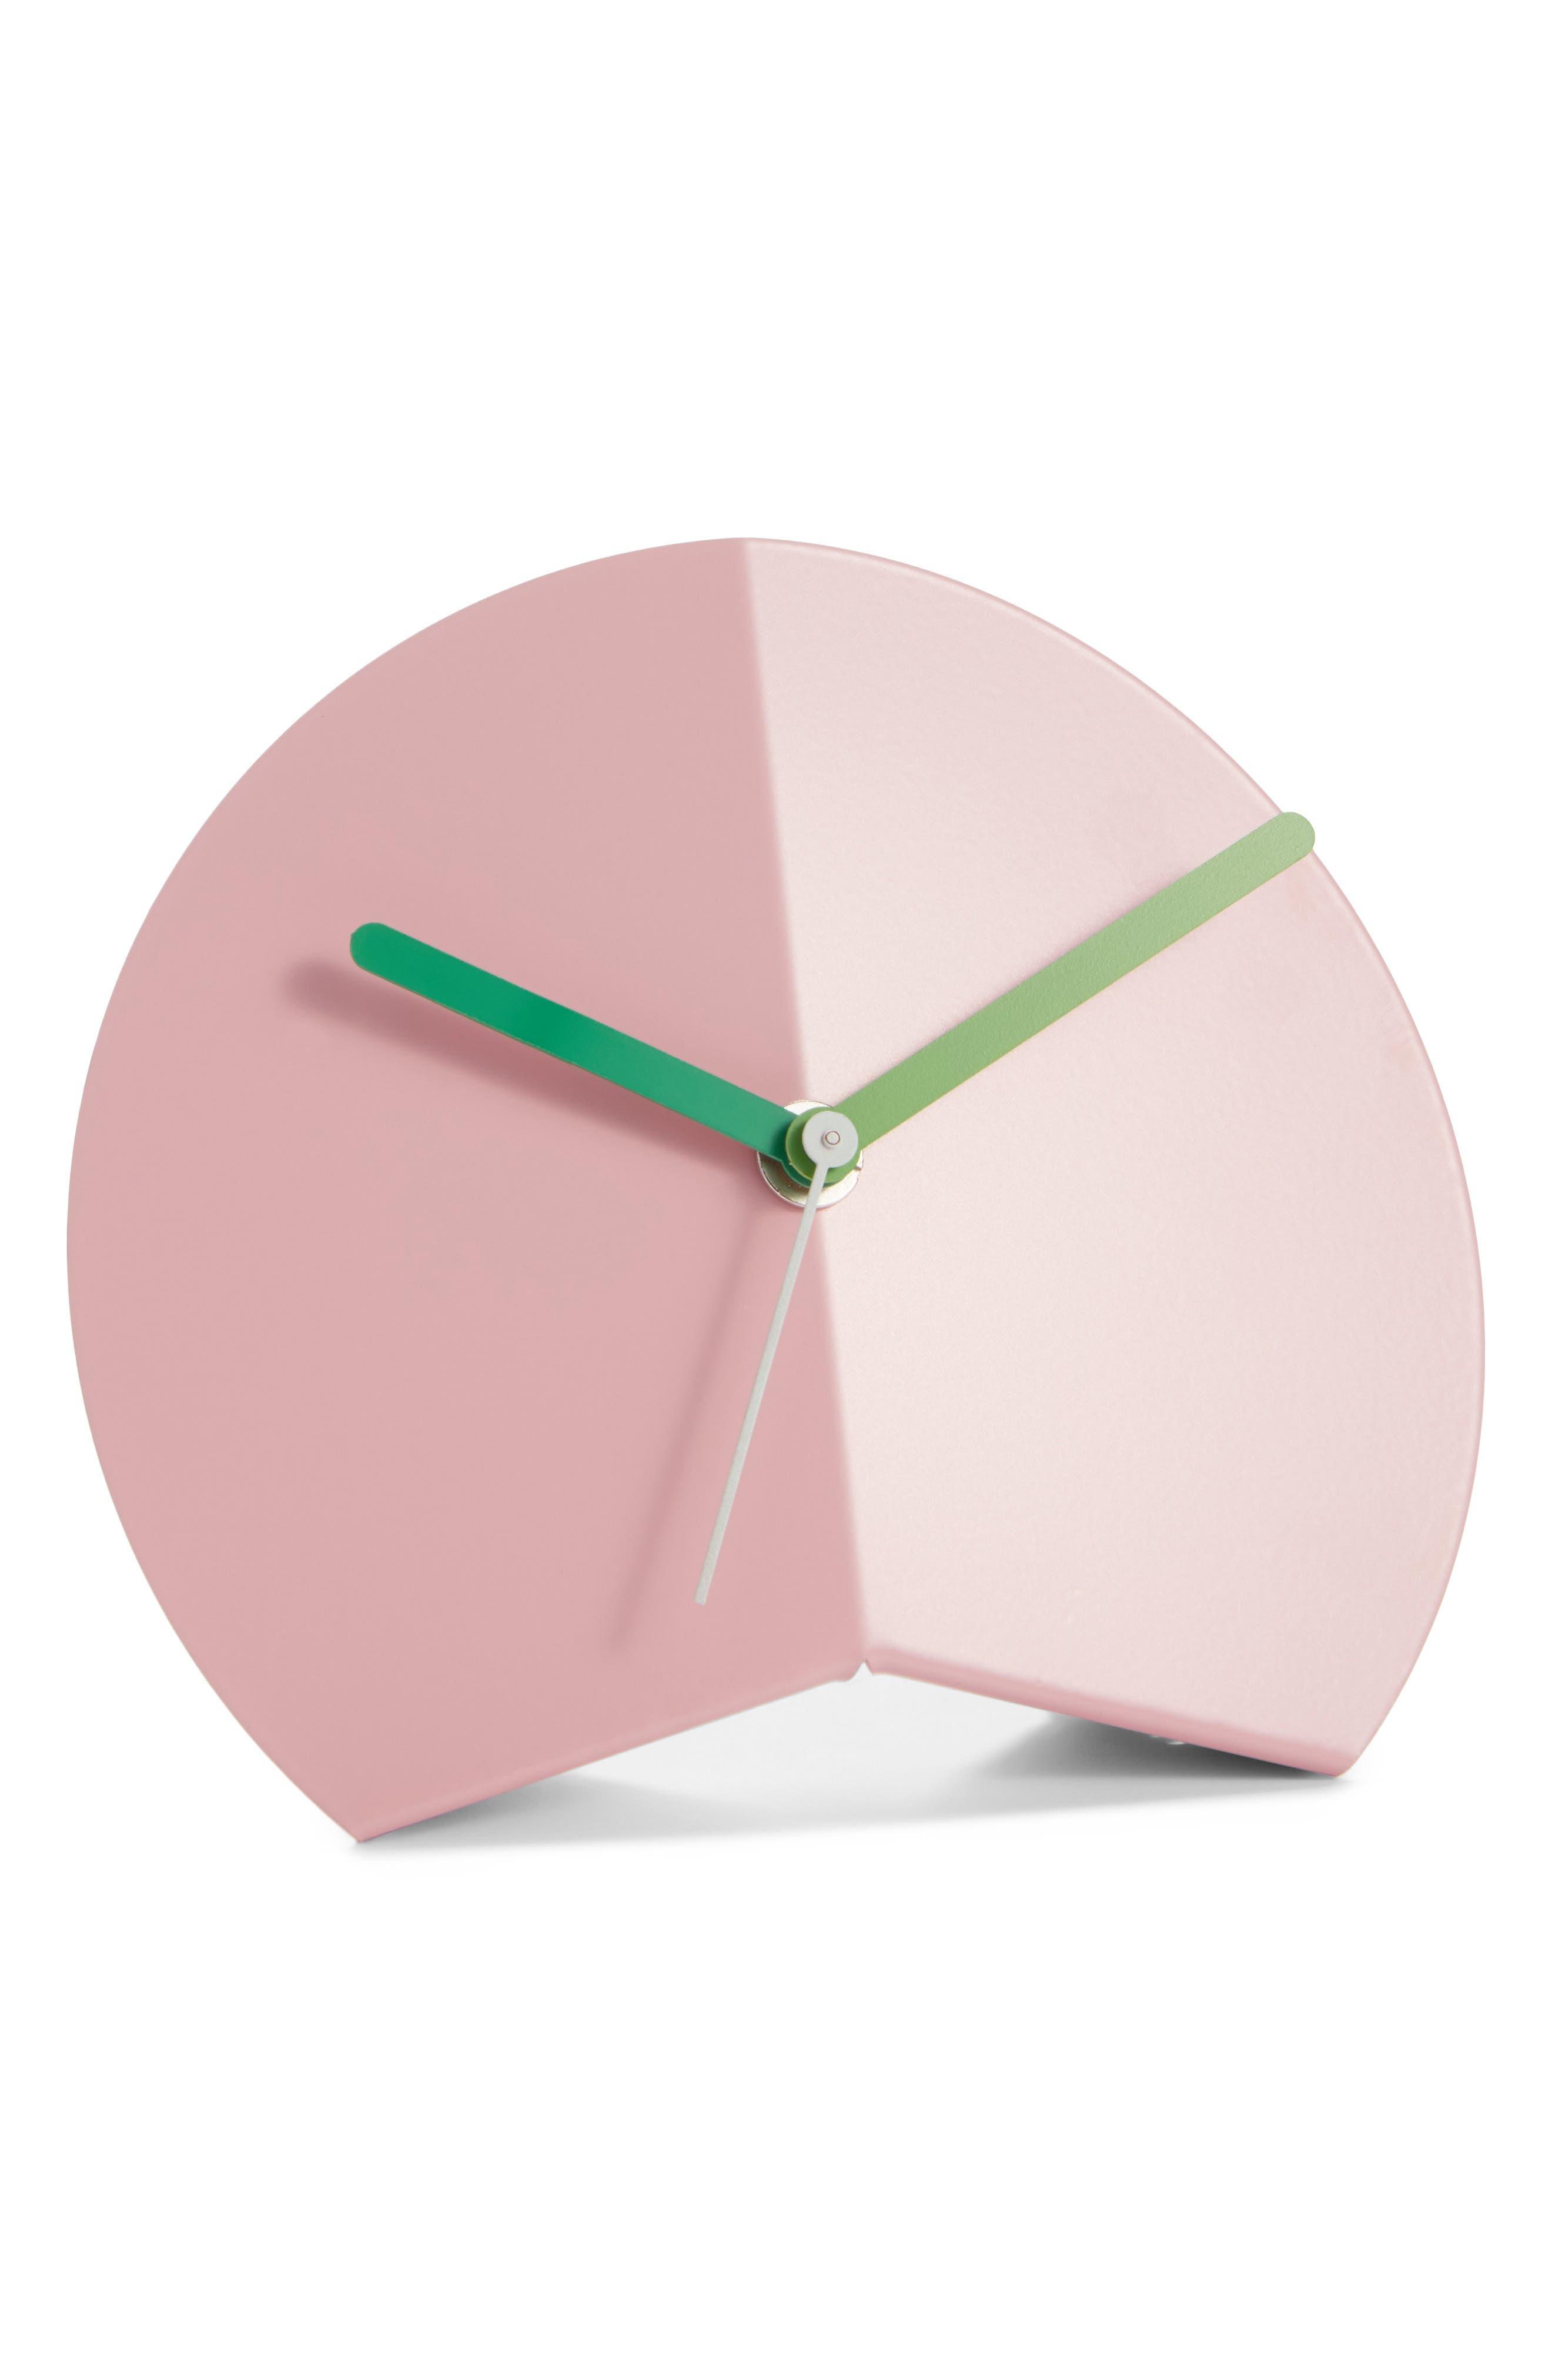 Mountain Fold Desk Clock,                         Main,                         color, PINK